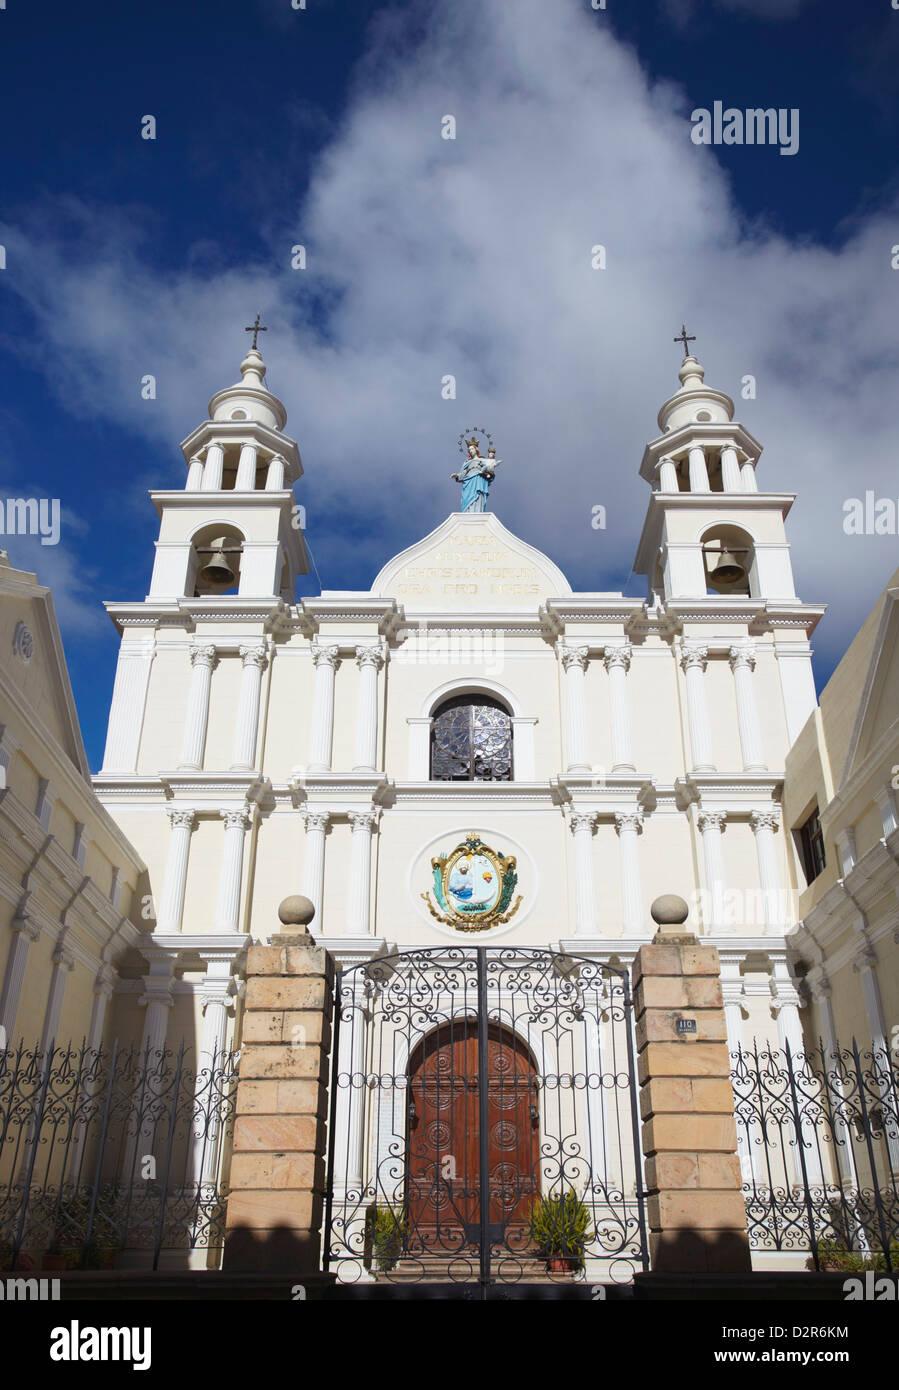 Iglesia Maria Auxiliadora, Sucre, UNESCO World Heritage Site, Bolivia, South America - Stock Image